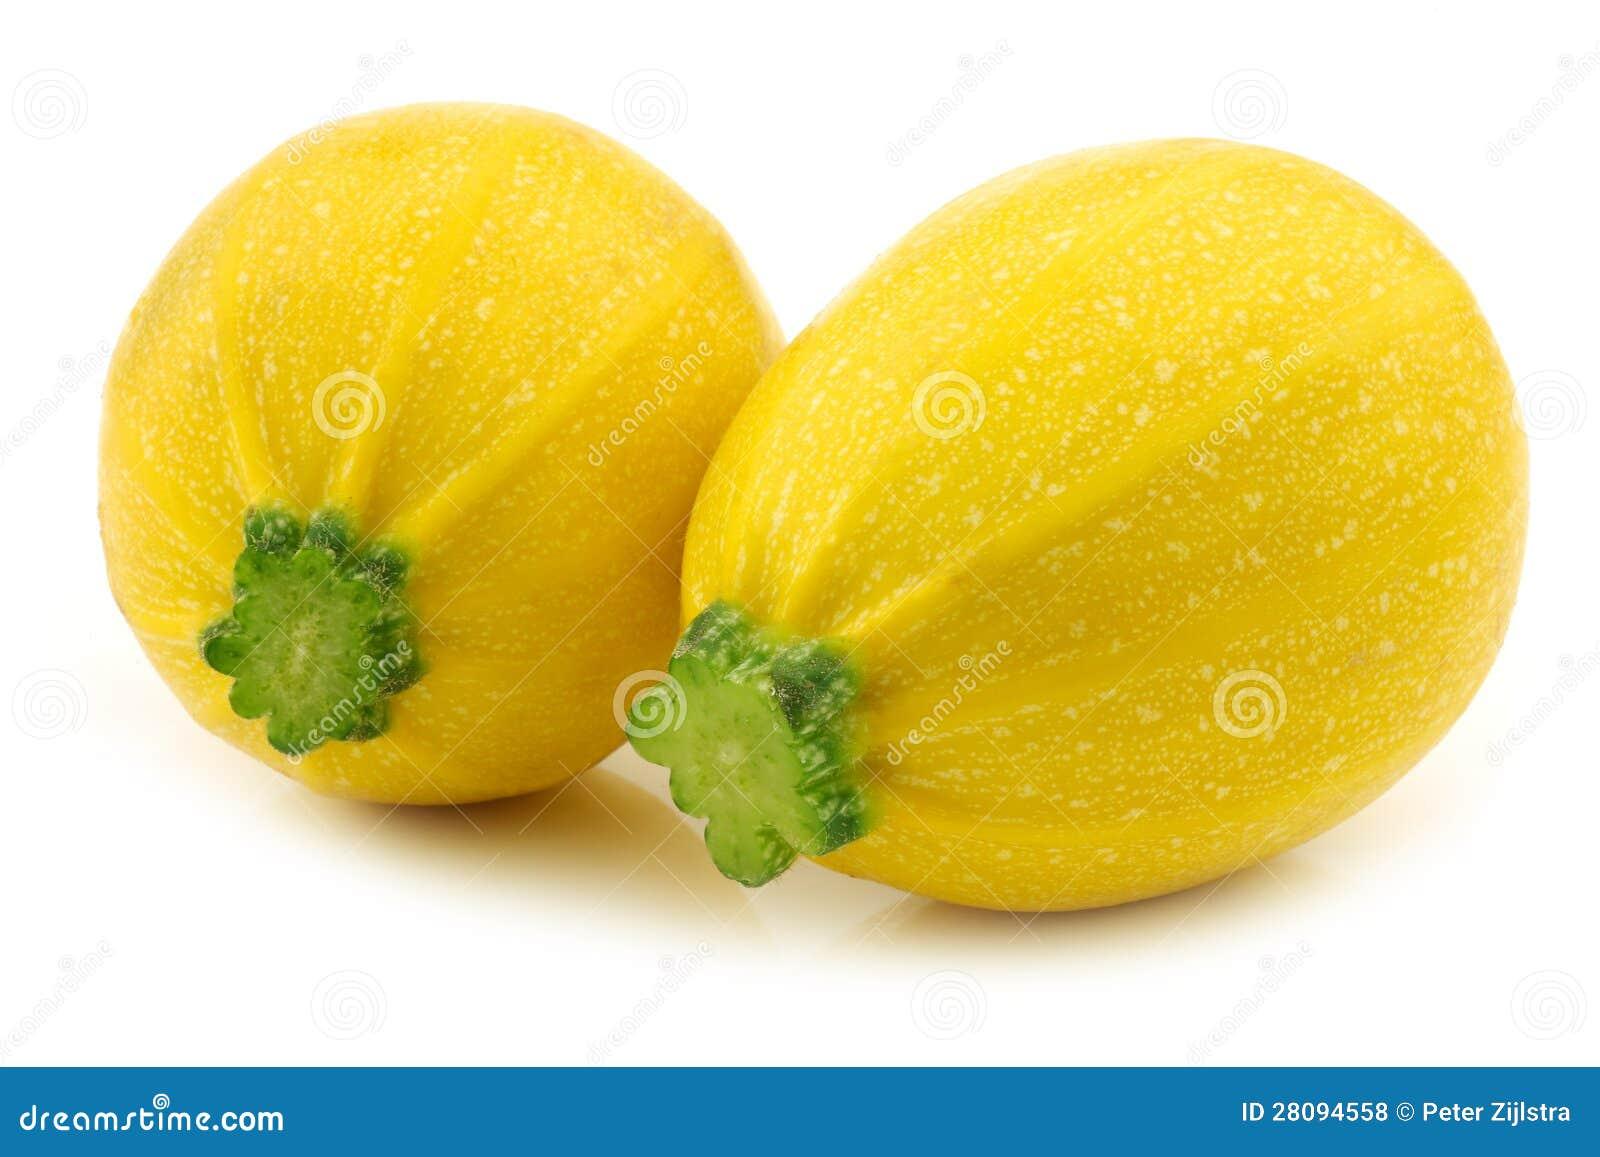 zwei gelber runder zucchini cucurbita pepo lizenzfreie stockfotos bild 28094558. Black Bedroom Furniture Sets. Home Design Ideas